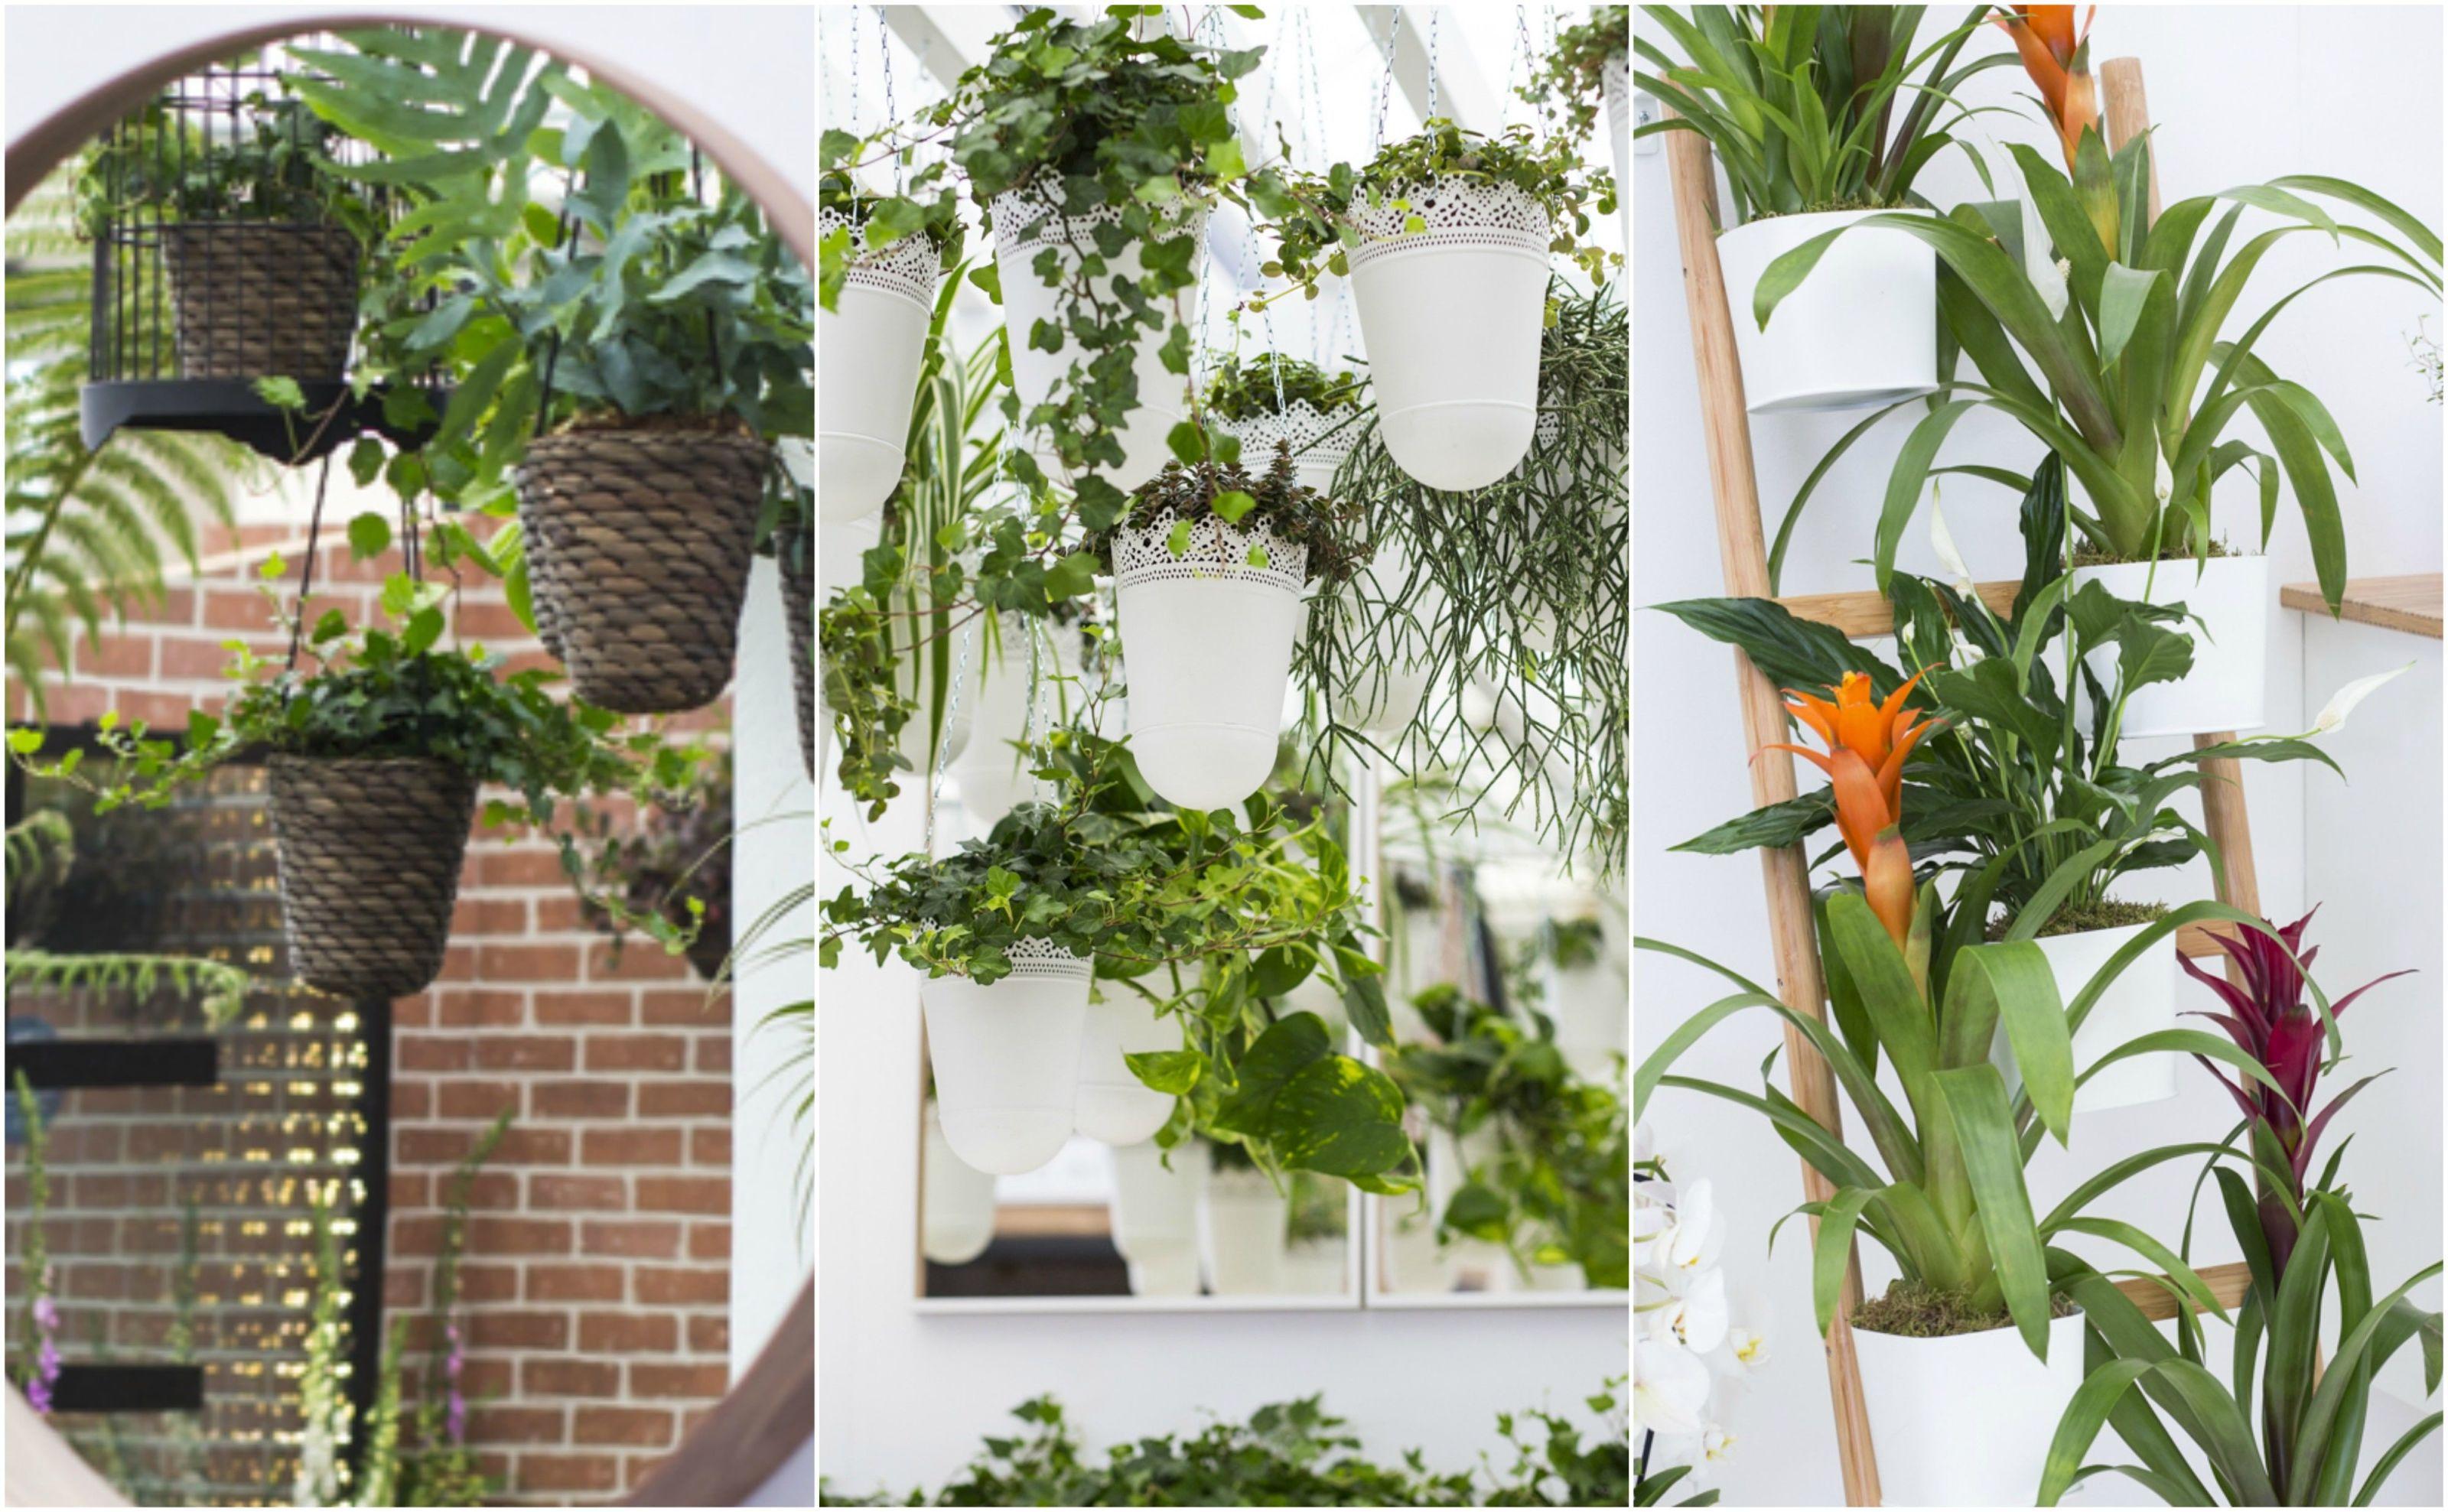 5 Easy Indoor Garden Ideas - Small Space Ideas